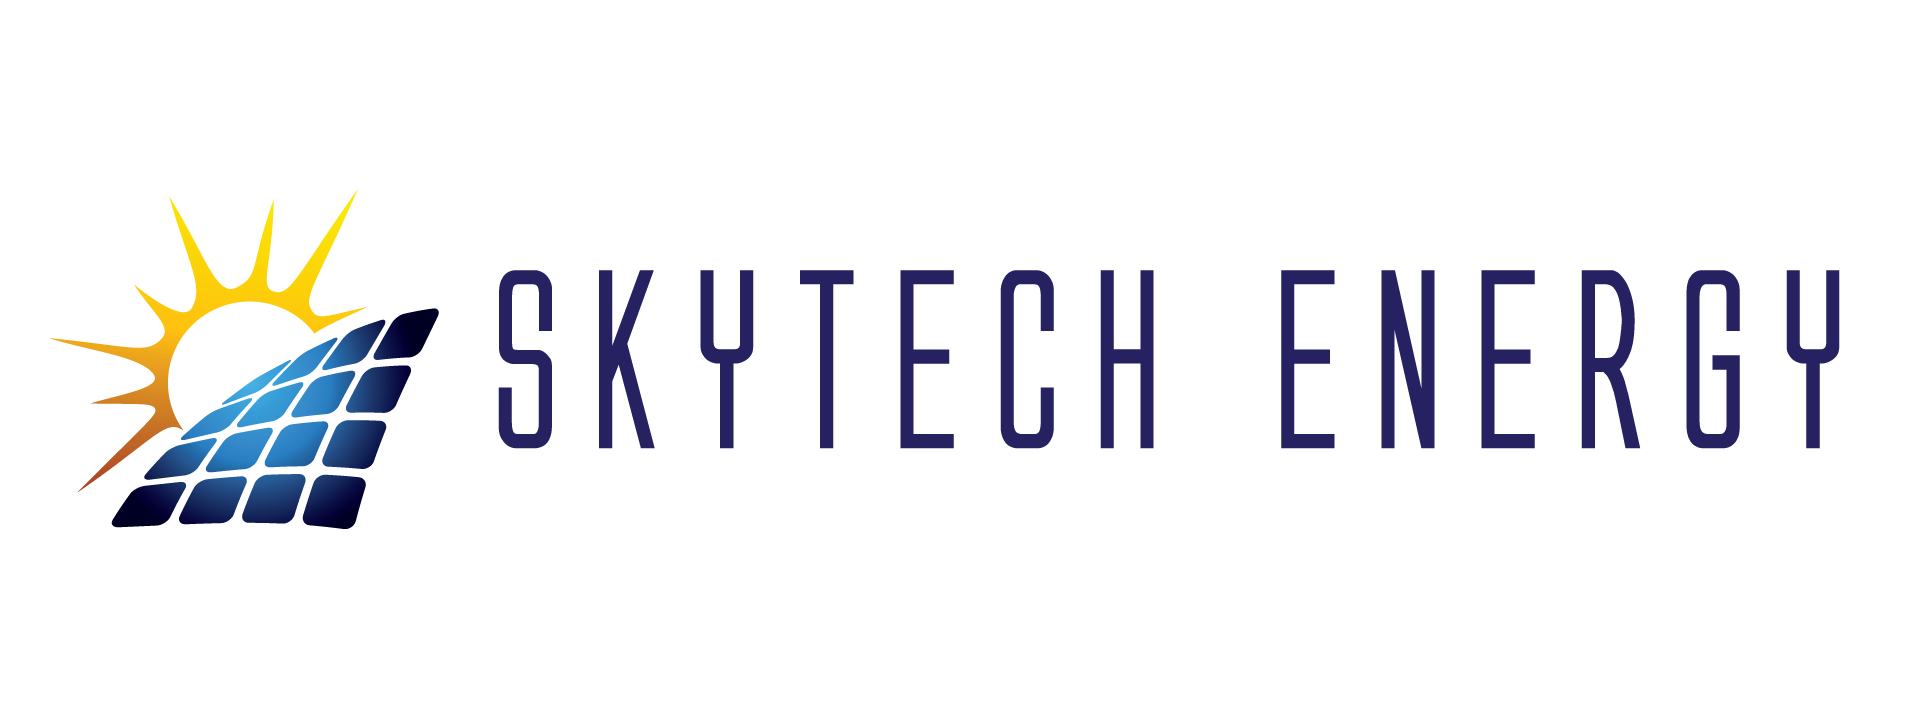 SkyTech Energy